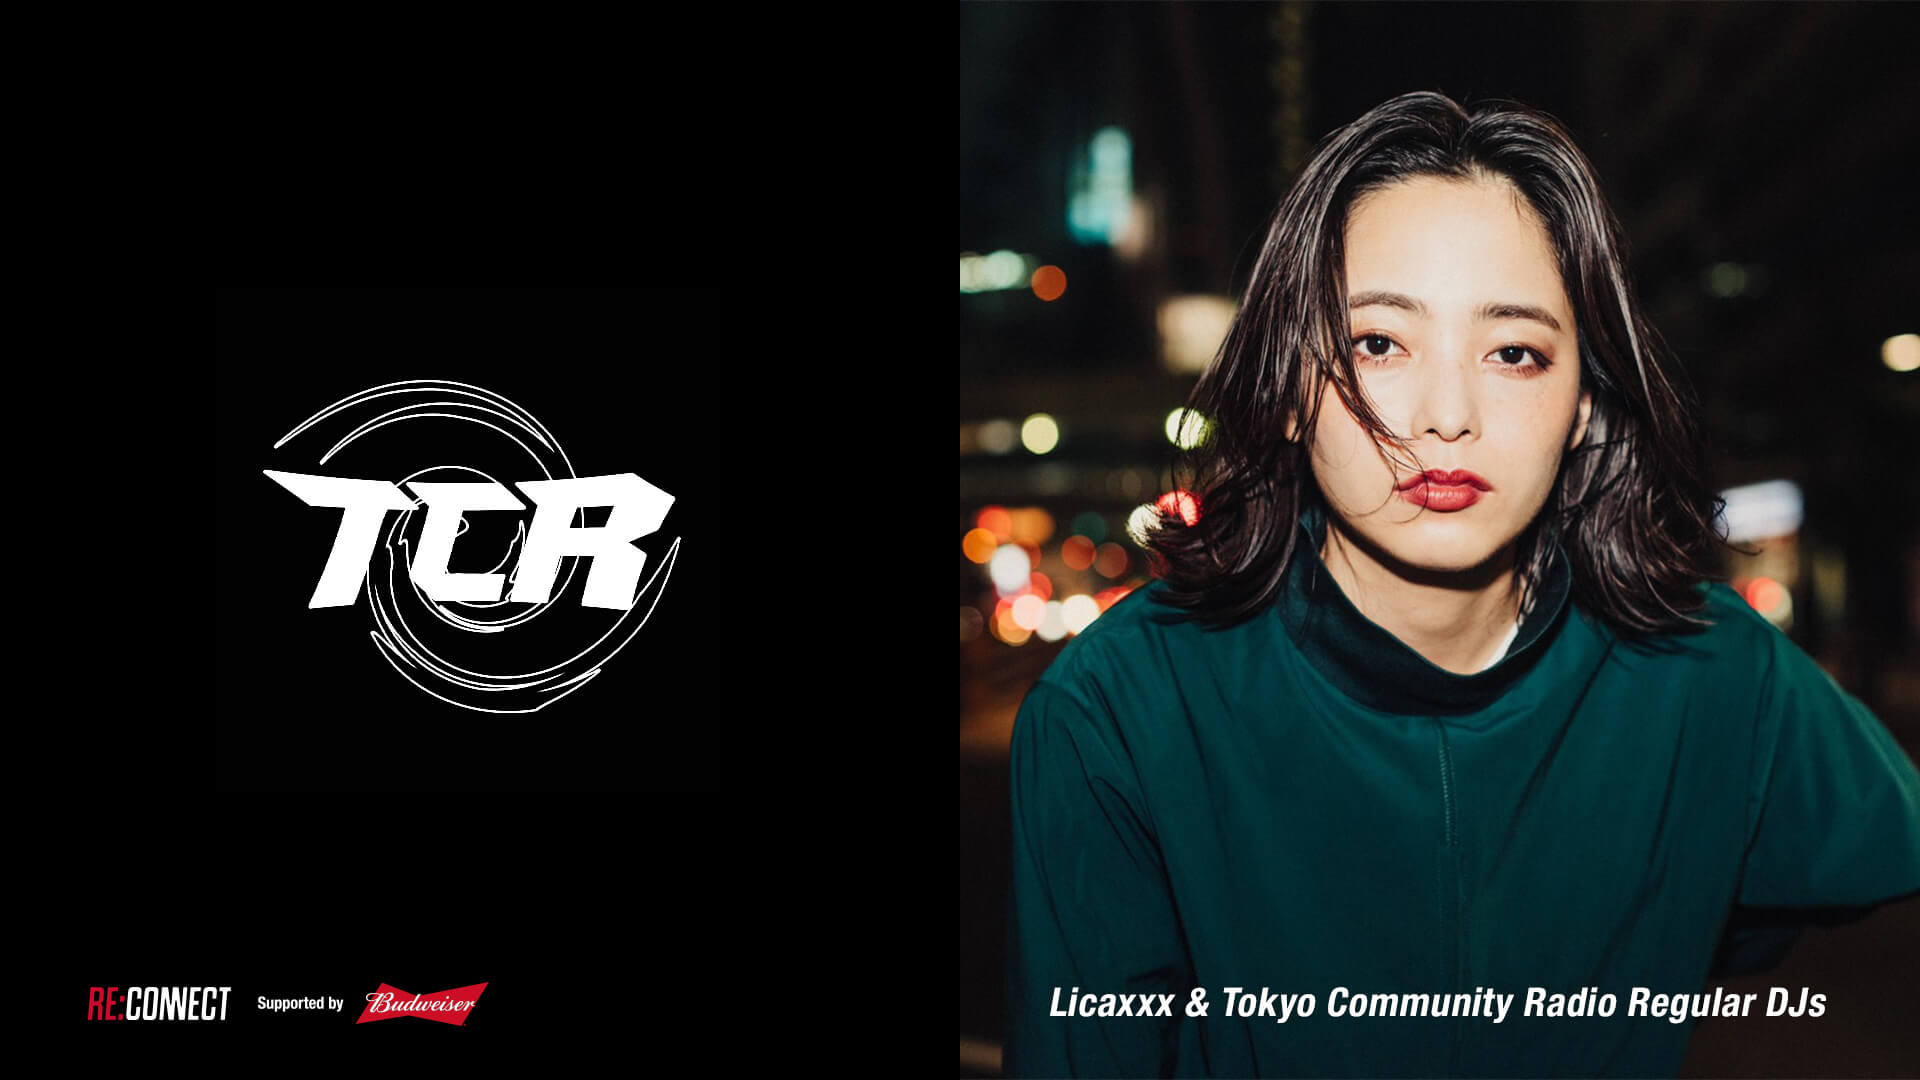 BIMのBLITZライブ配信&Tokyo Community Radioの DJ配信をバドワイザー「RE:CONNECT」が支援決定! music200709_reconnect_3